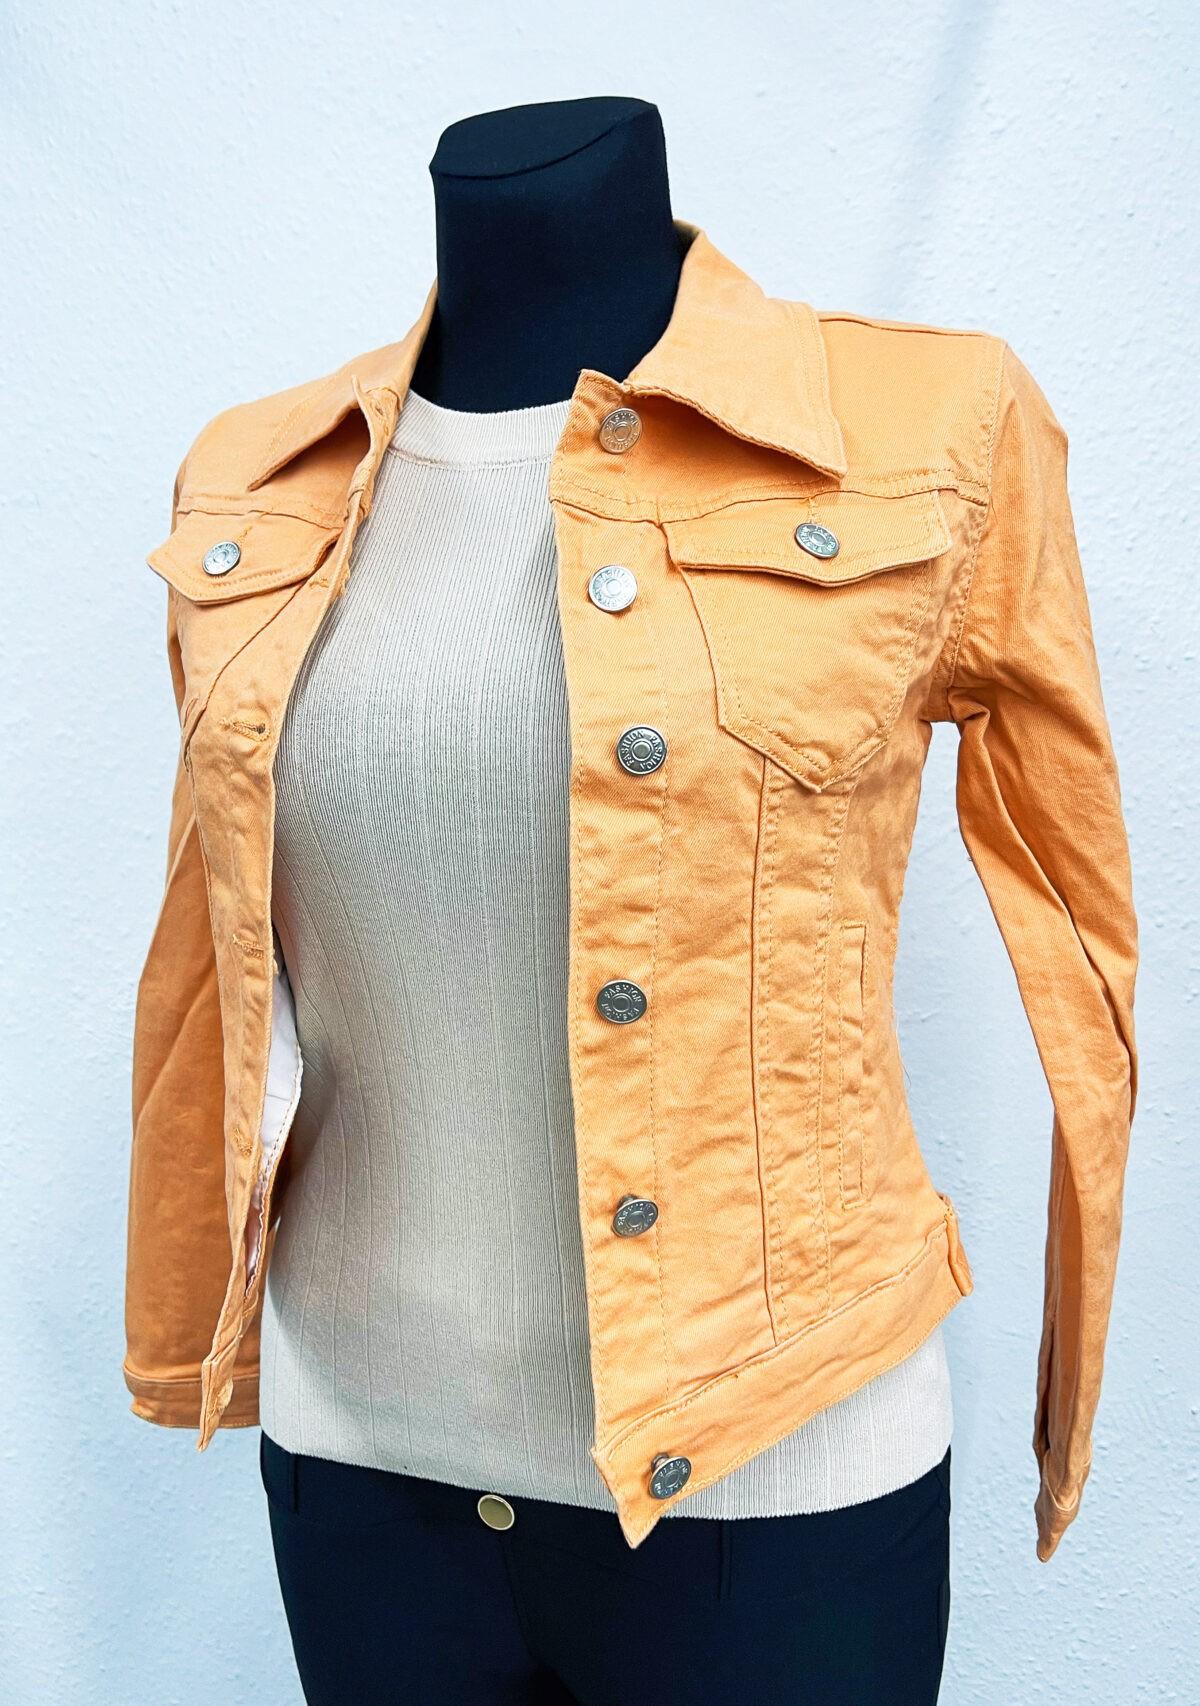 BCE9E719 5659 4C9C A51B C2F1CD6375D1 scaled Osili - Fashion - Divat